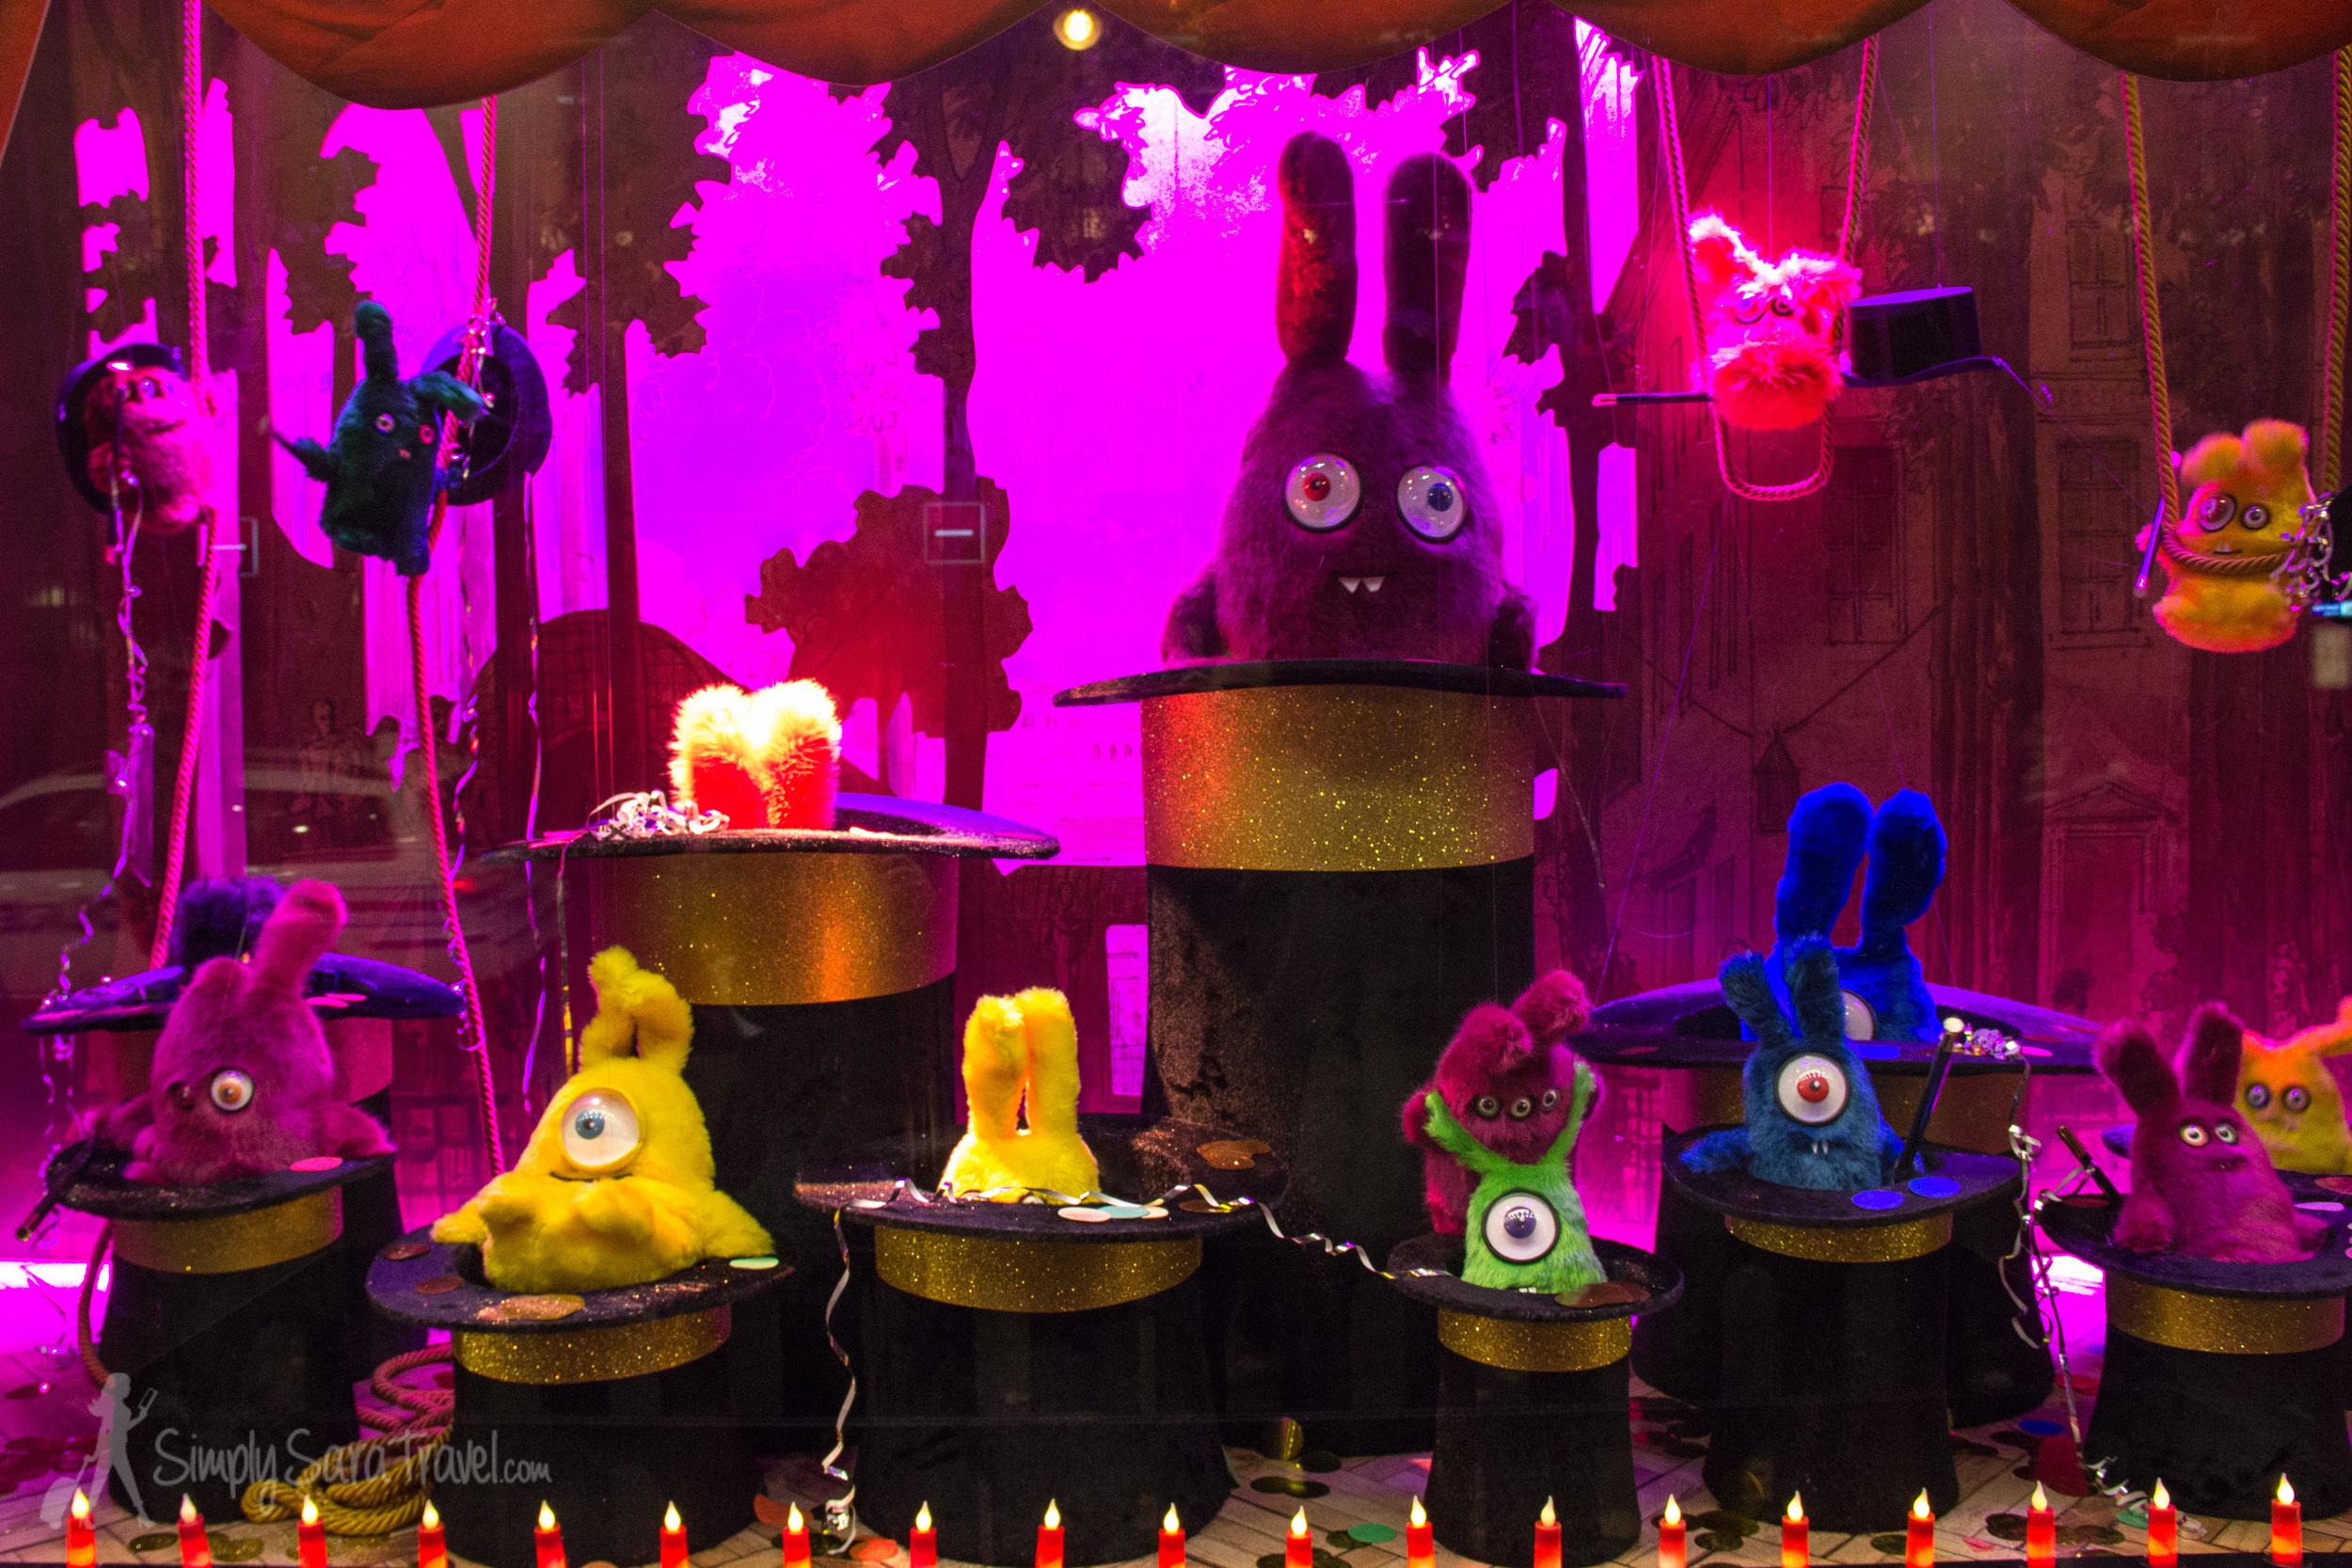 Definitely the creepier part of the display! Alien bunnies?